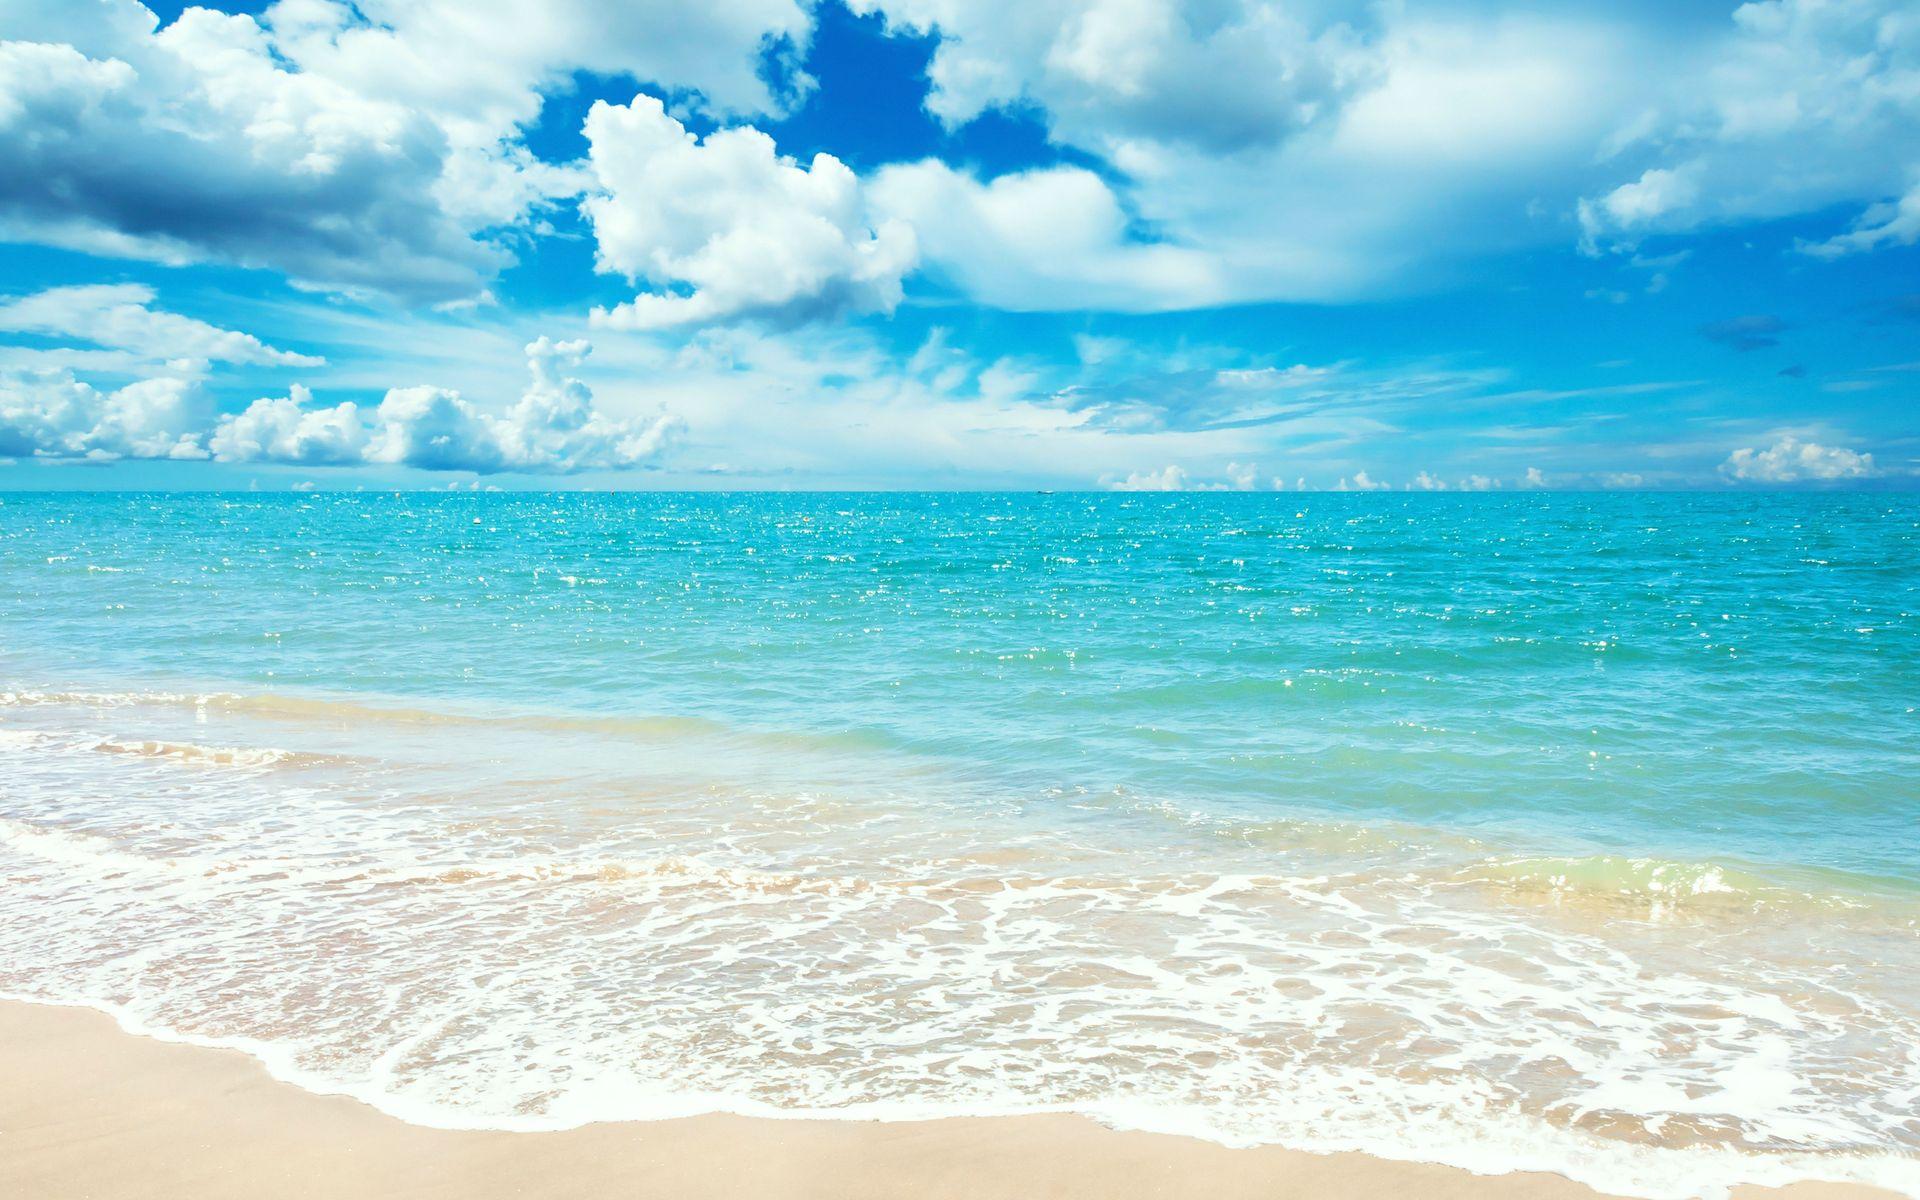 HD Background Wallpaper Blue Beach WallpaperSafari